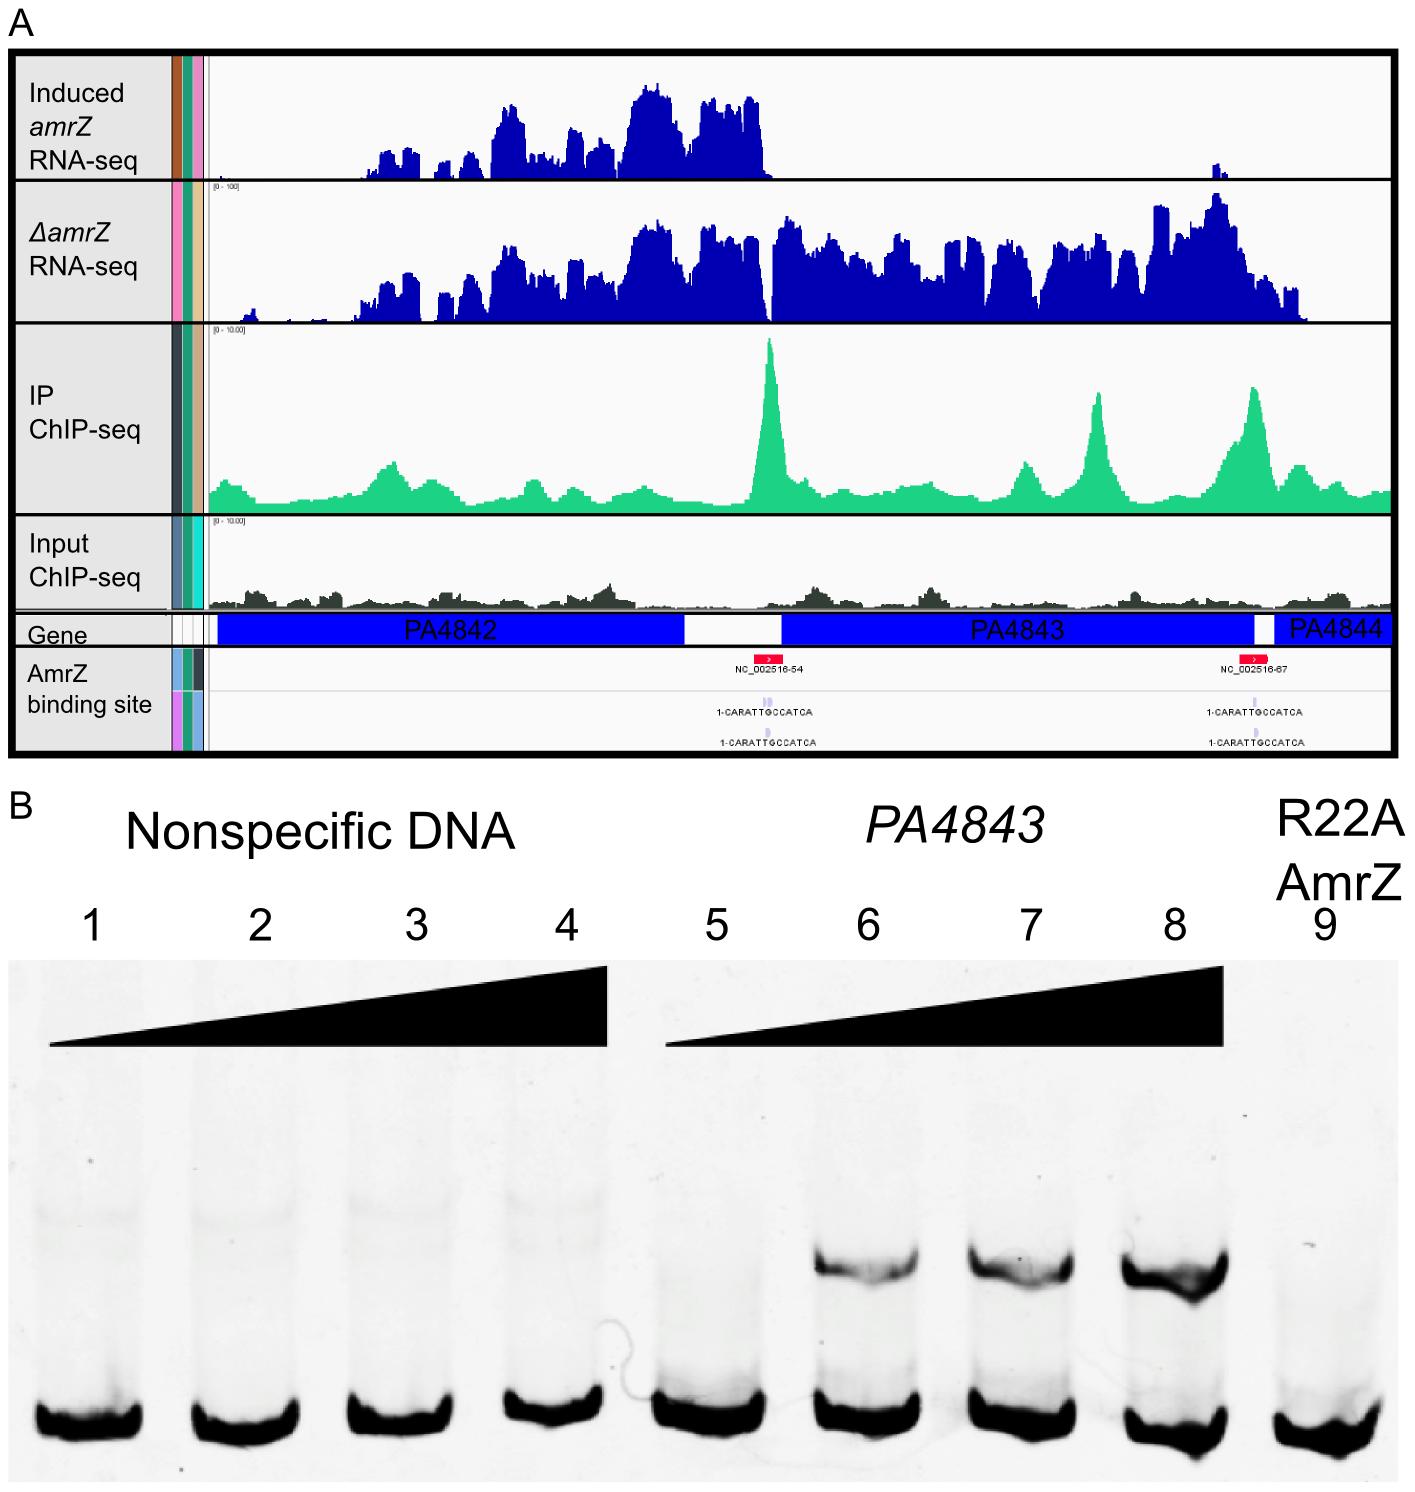 Analysis of ChIP-Seq and RNA-Seq data identifies AmrZ regulon.